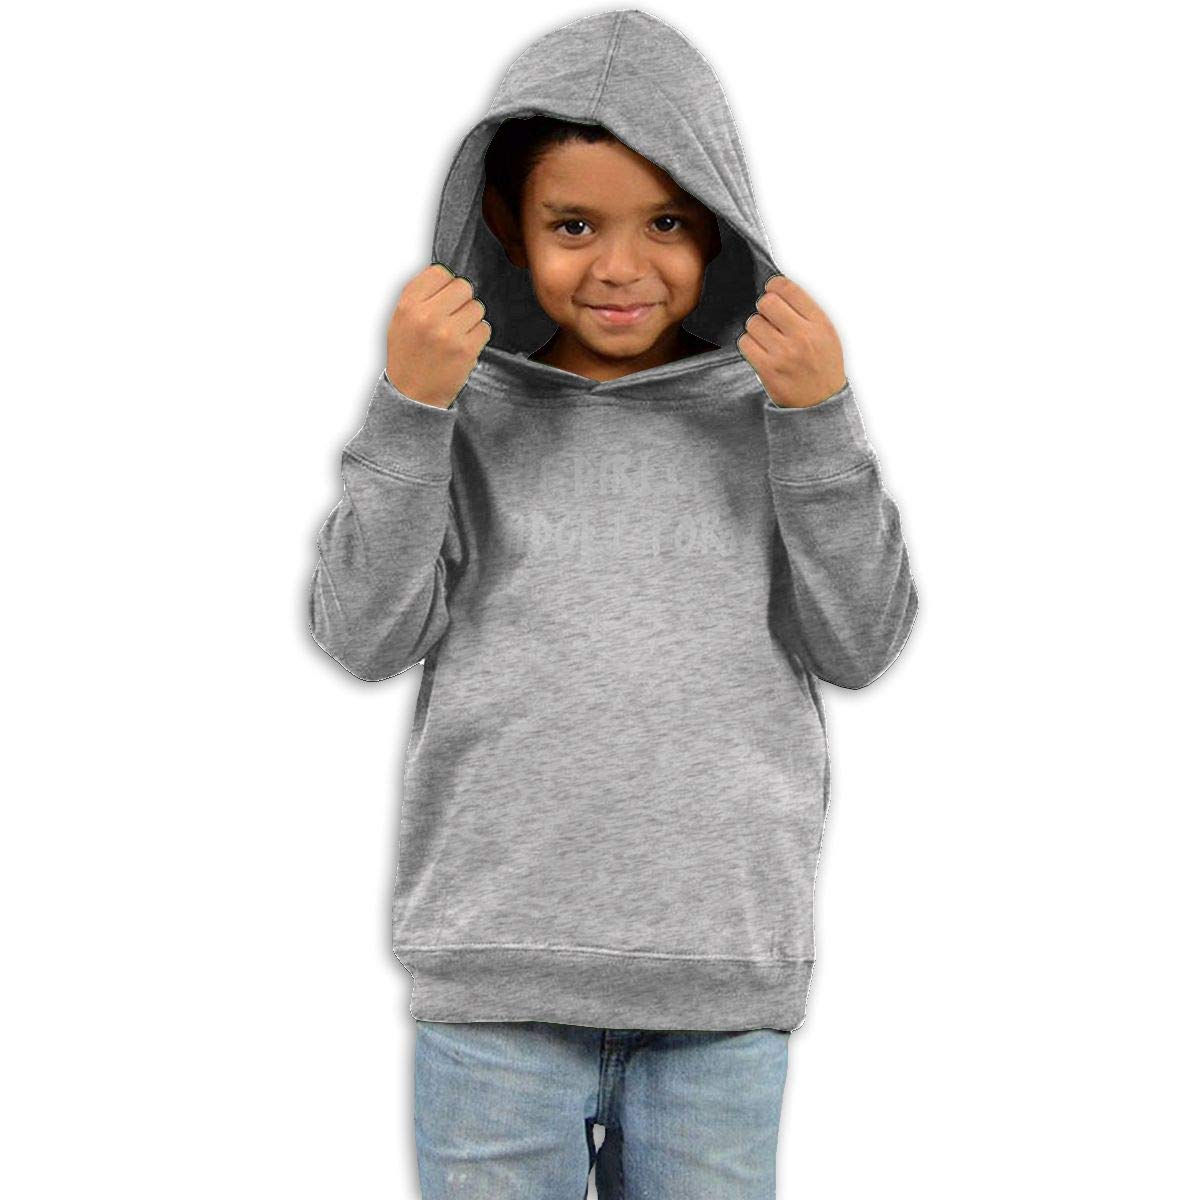 GUOZX Childrens Hooded Sweater I Direct Midget Porn Kids Sweater Black